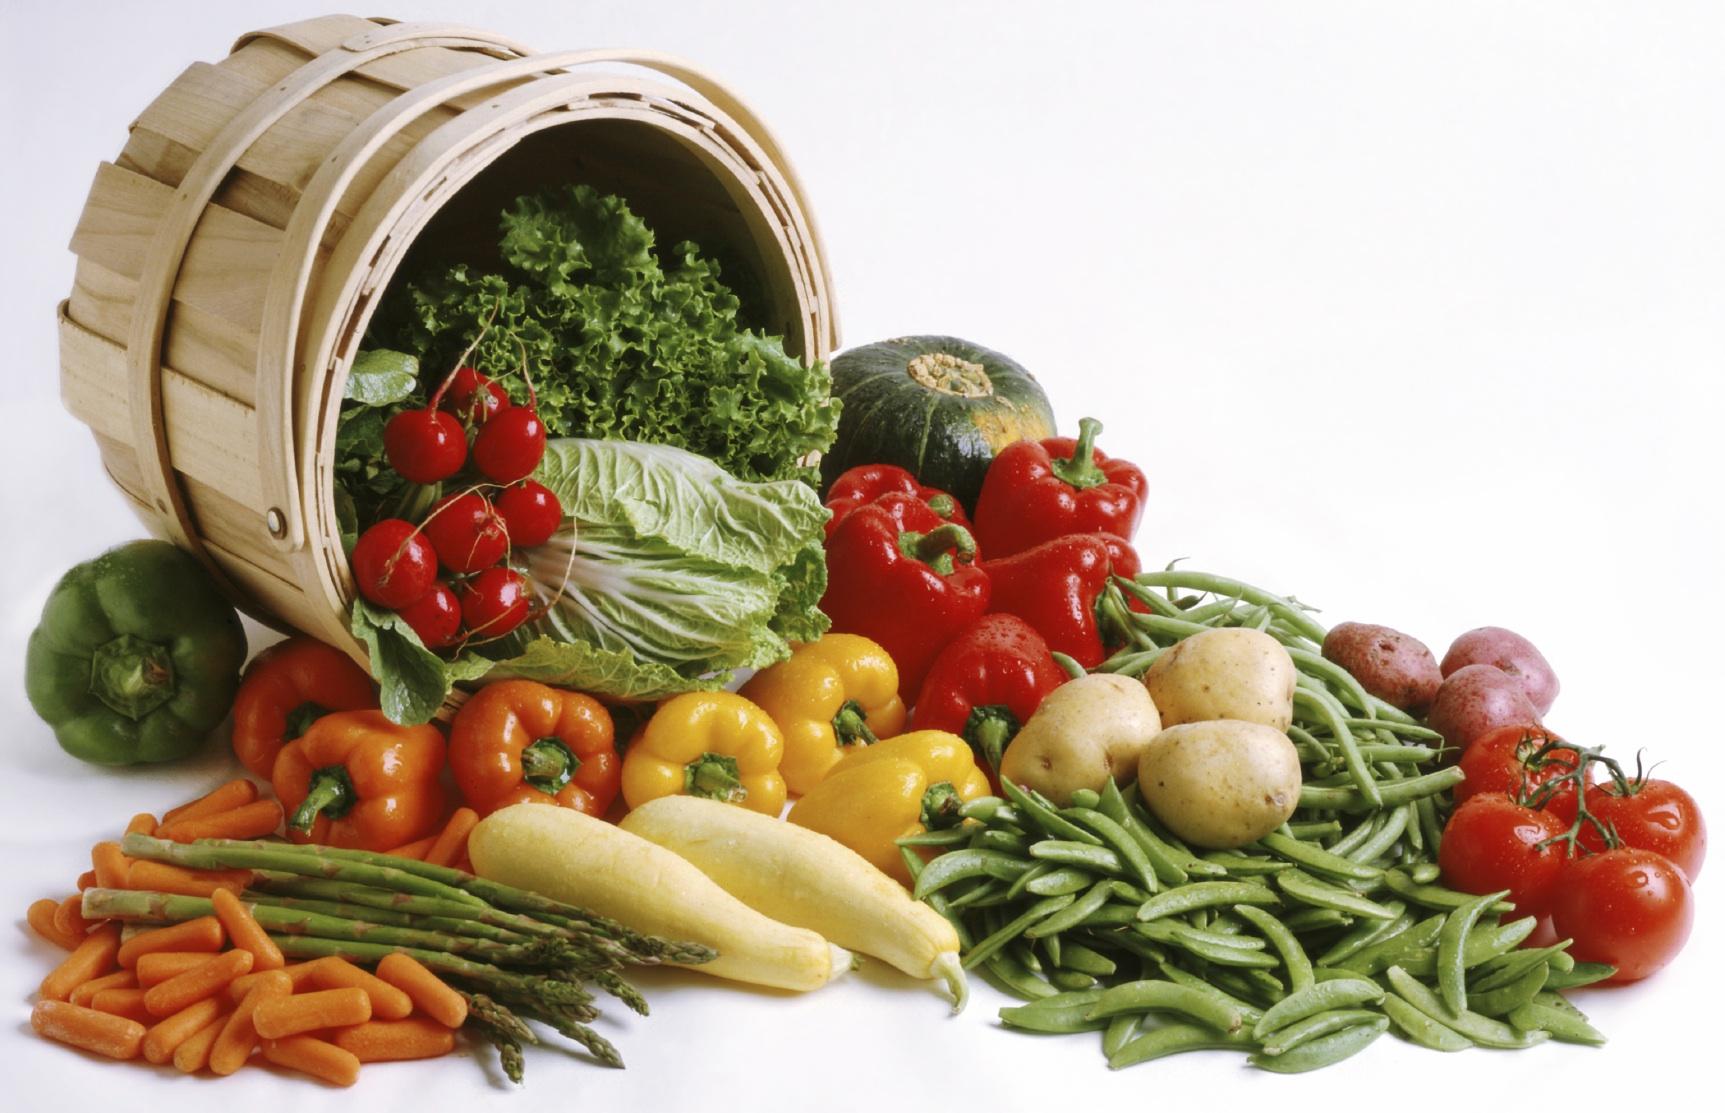 vegetables psu.edu.jpg